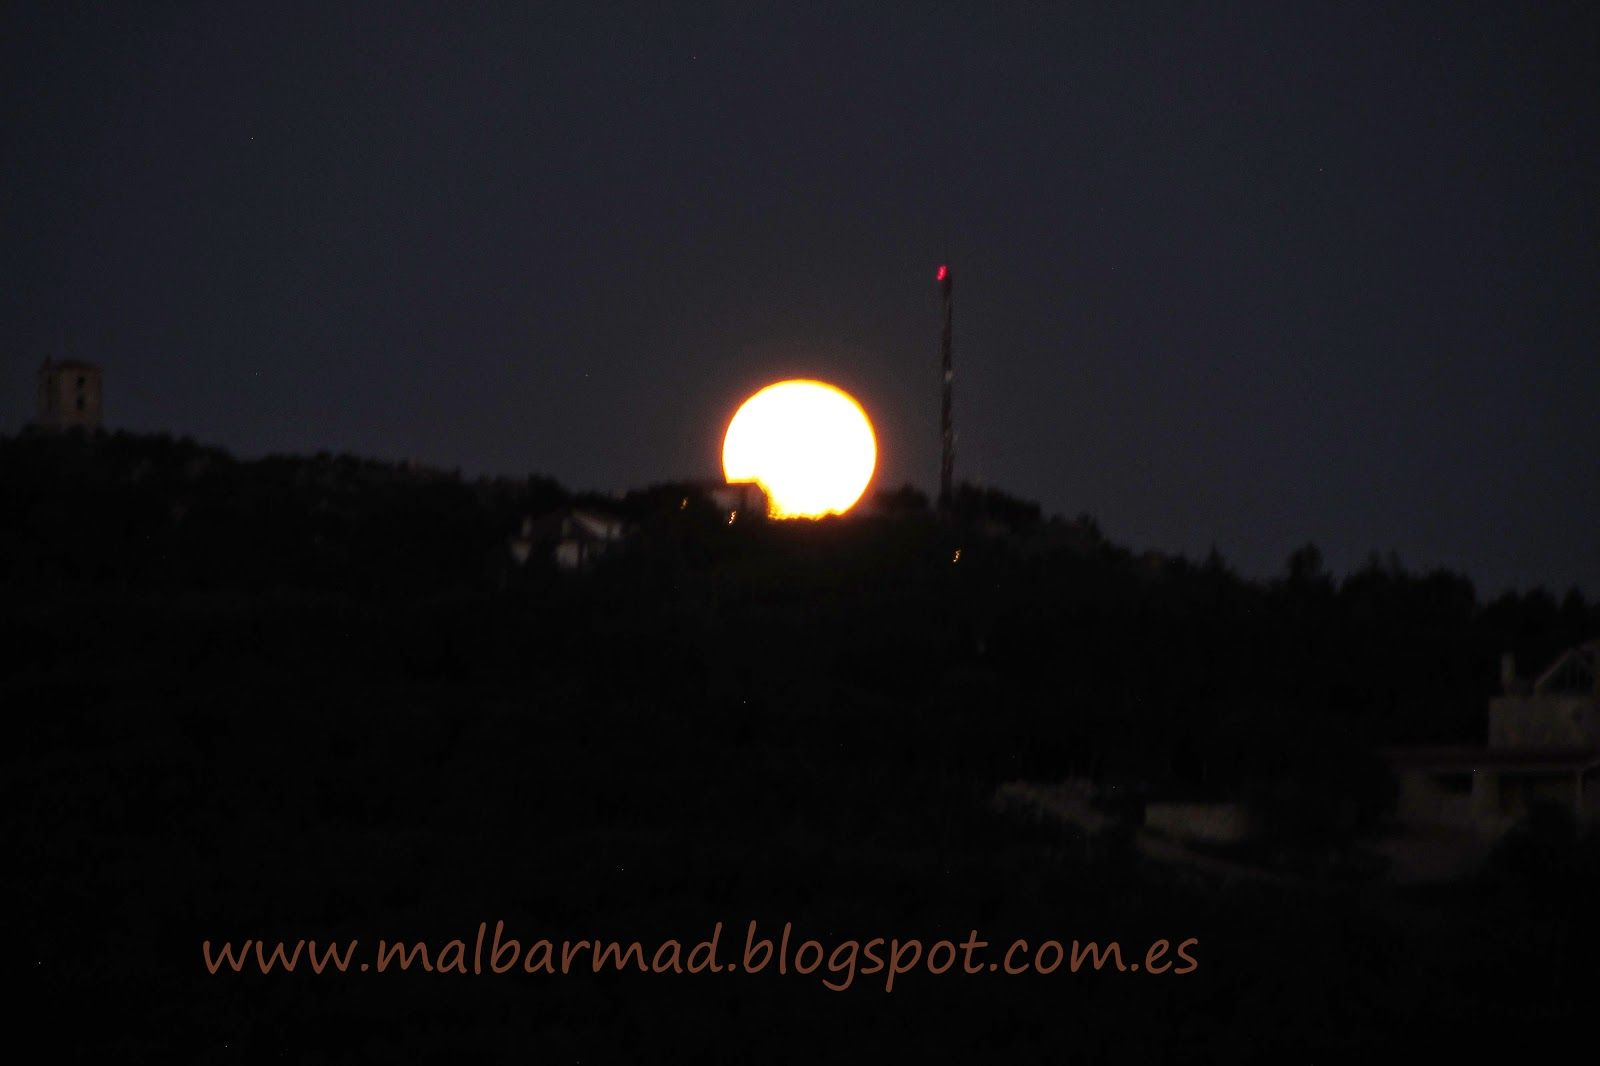 Mi Mundo en Fotografias: Luna llena de Abril